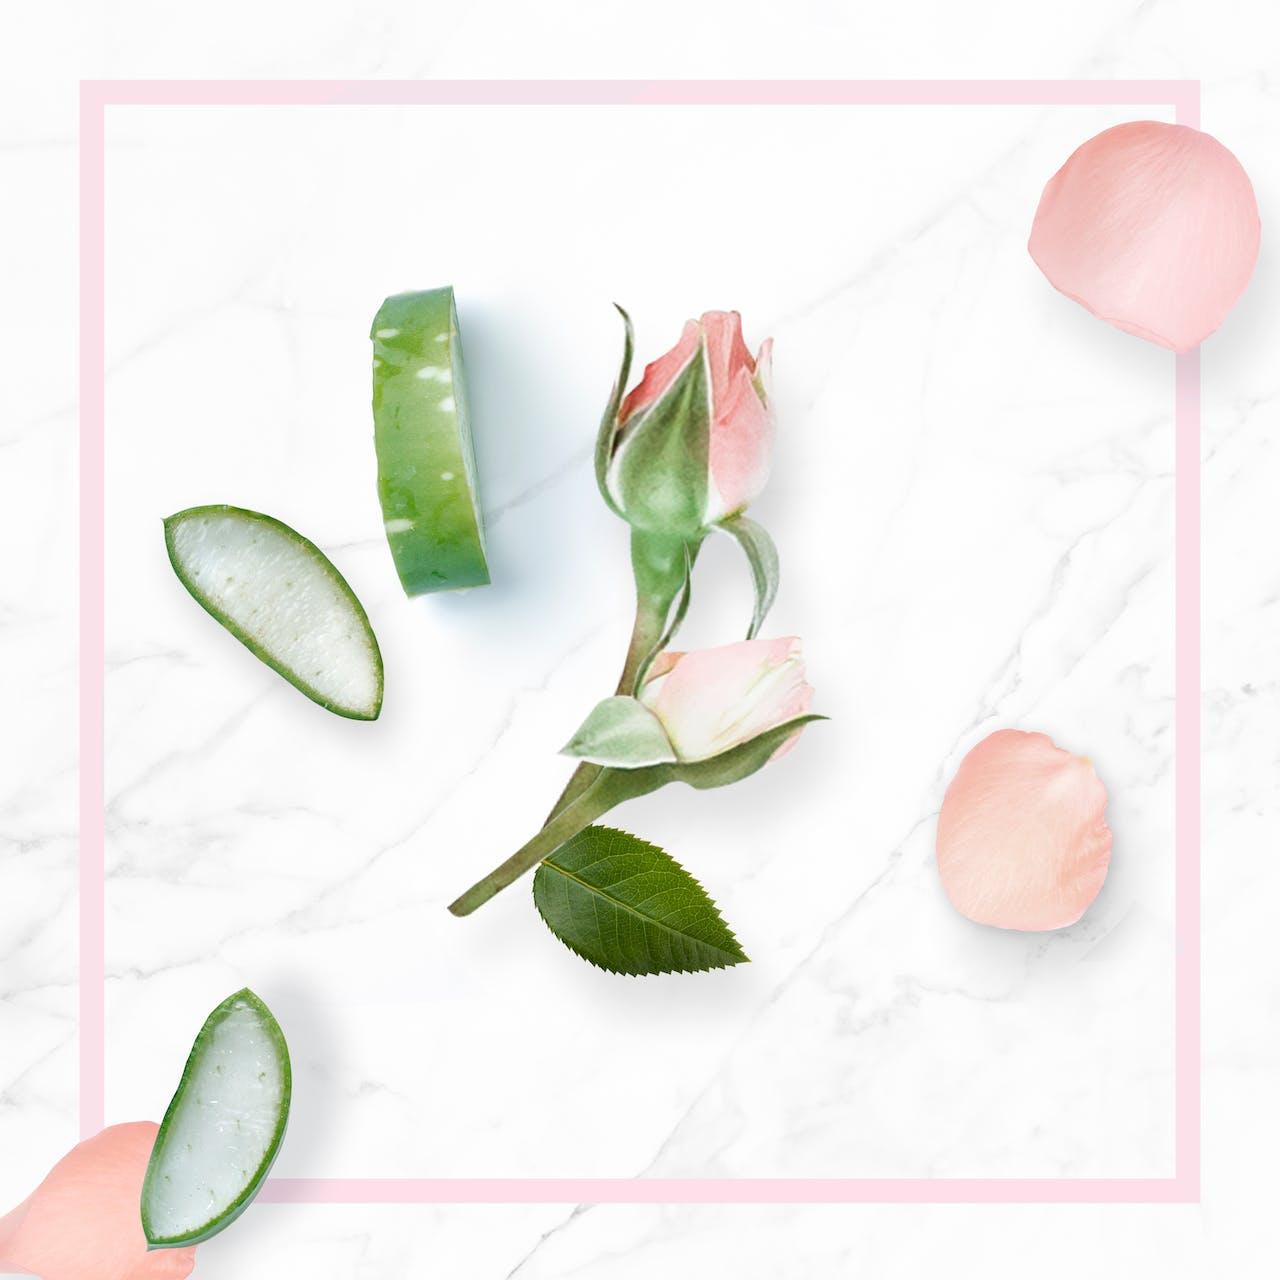 rose-damas-aloe-vera-b